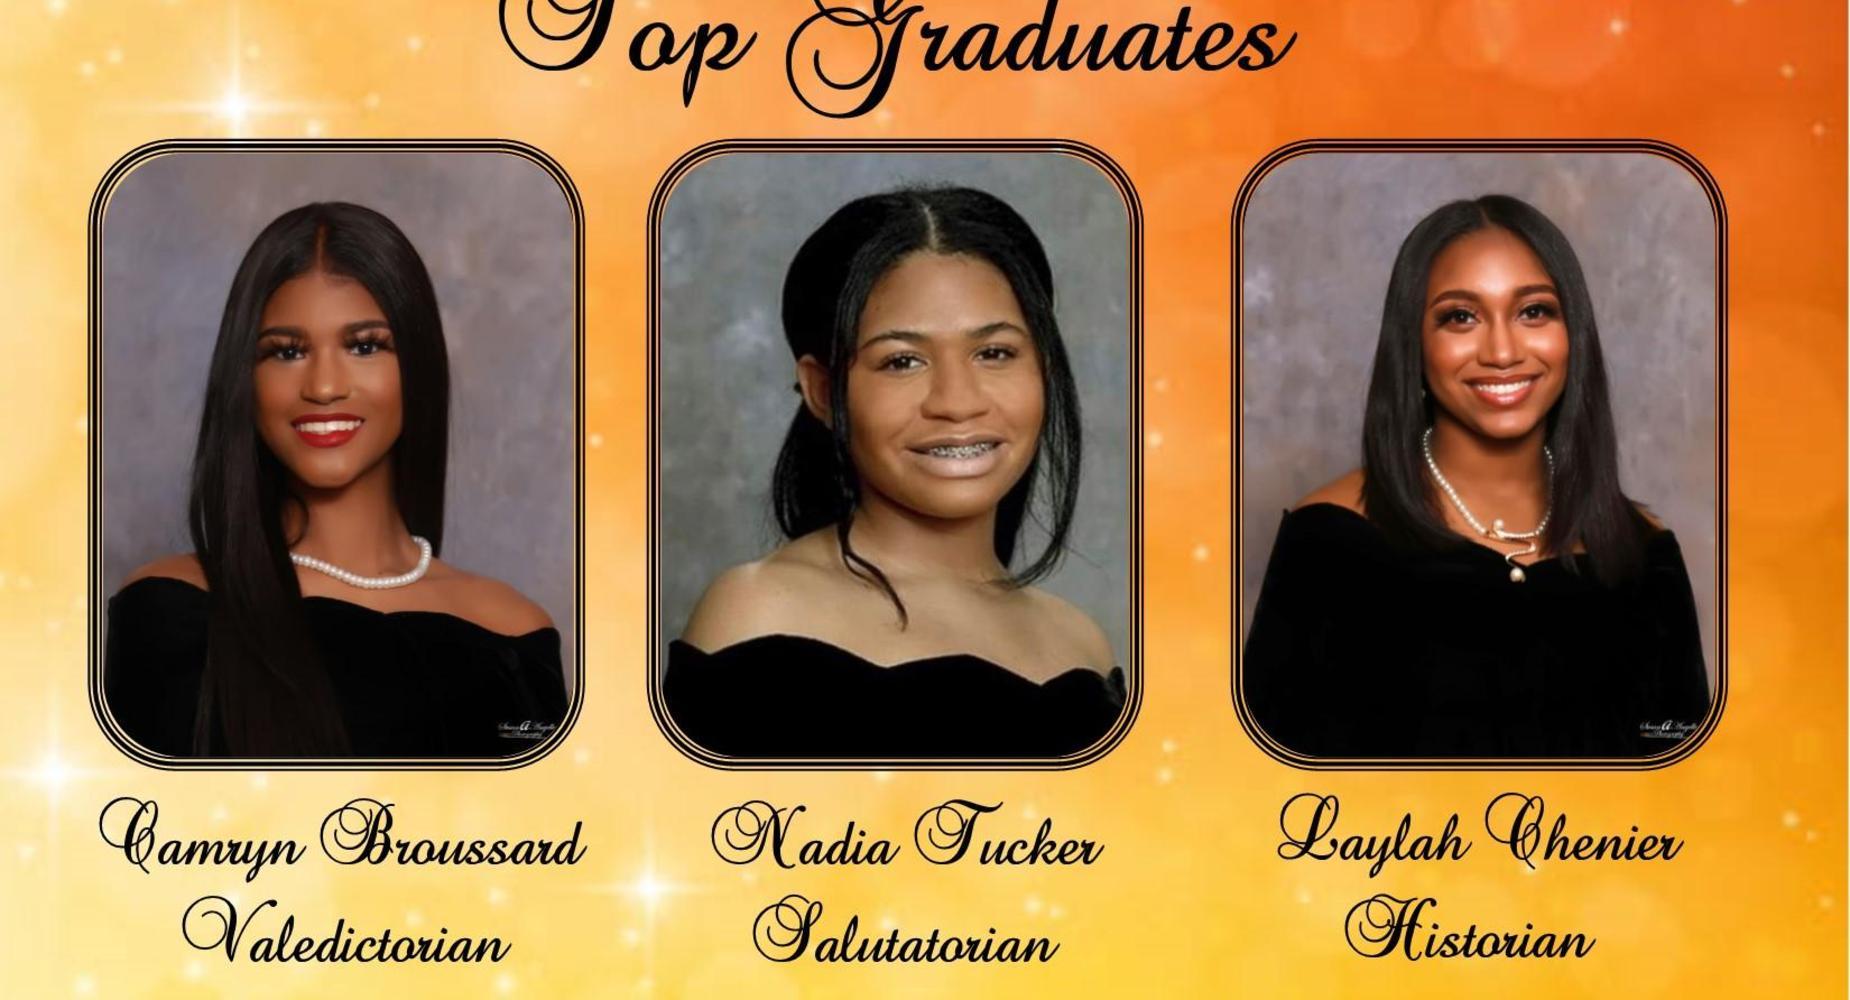 OHS Top Graduates